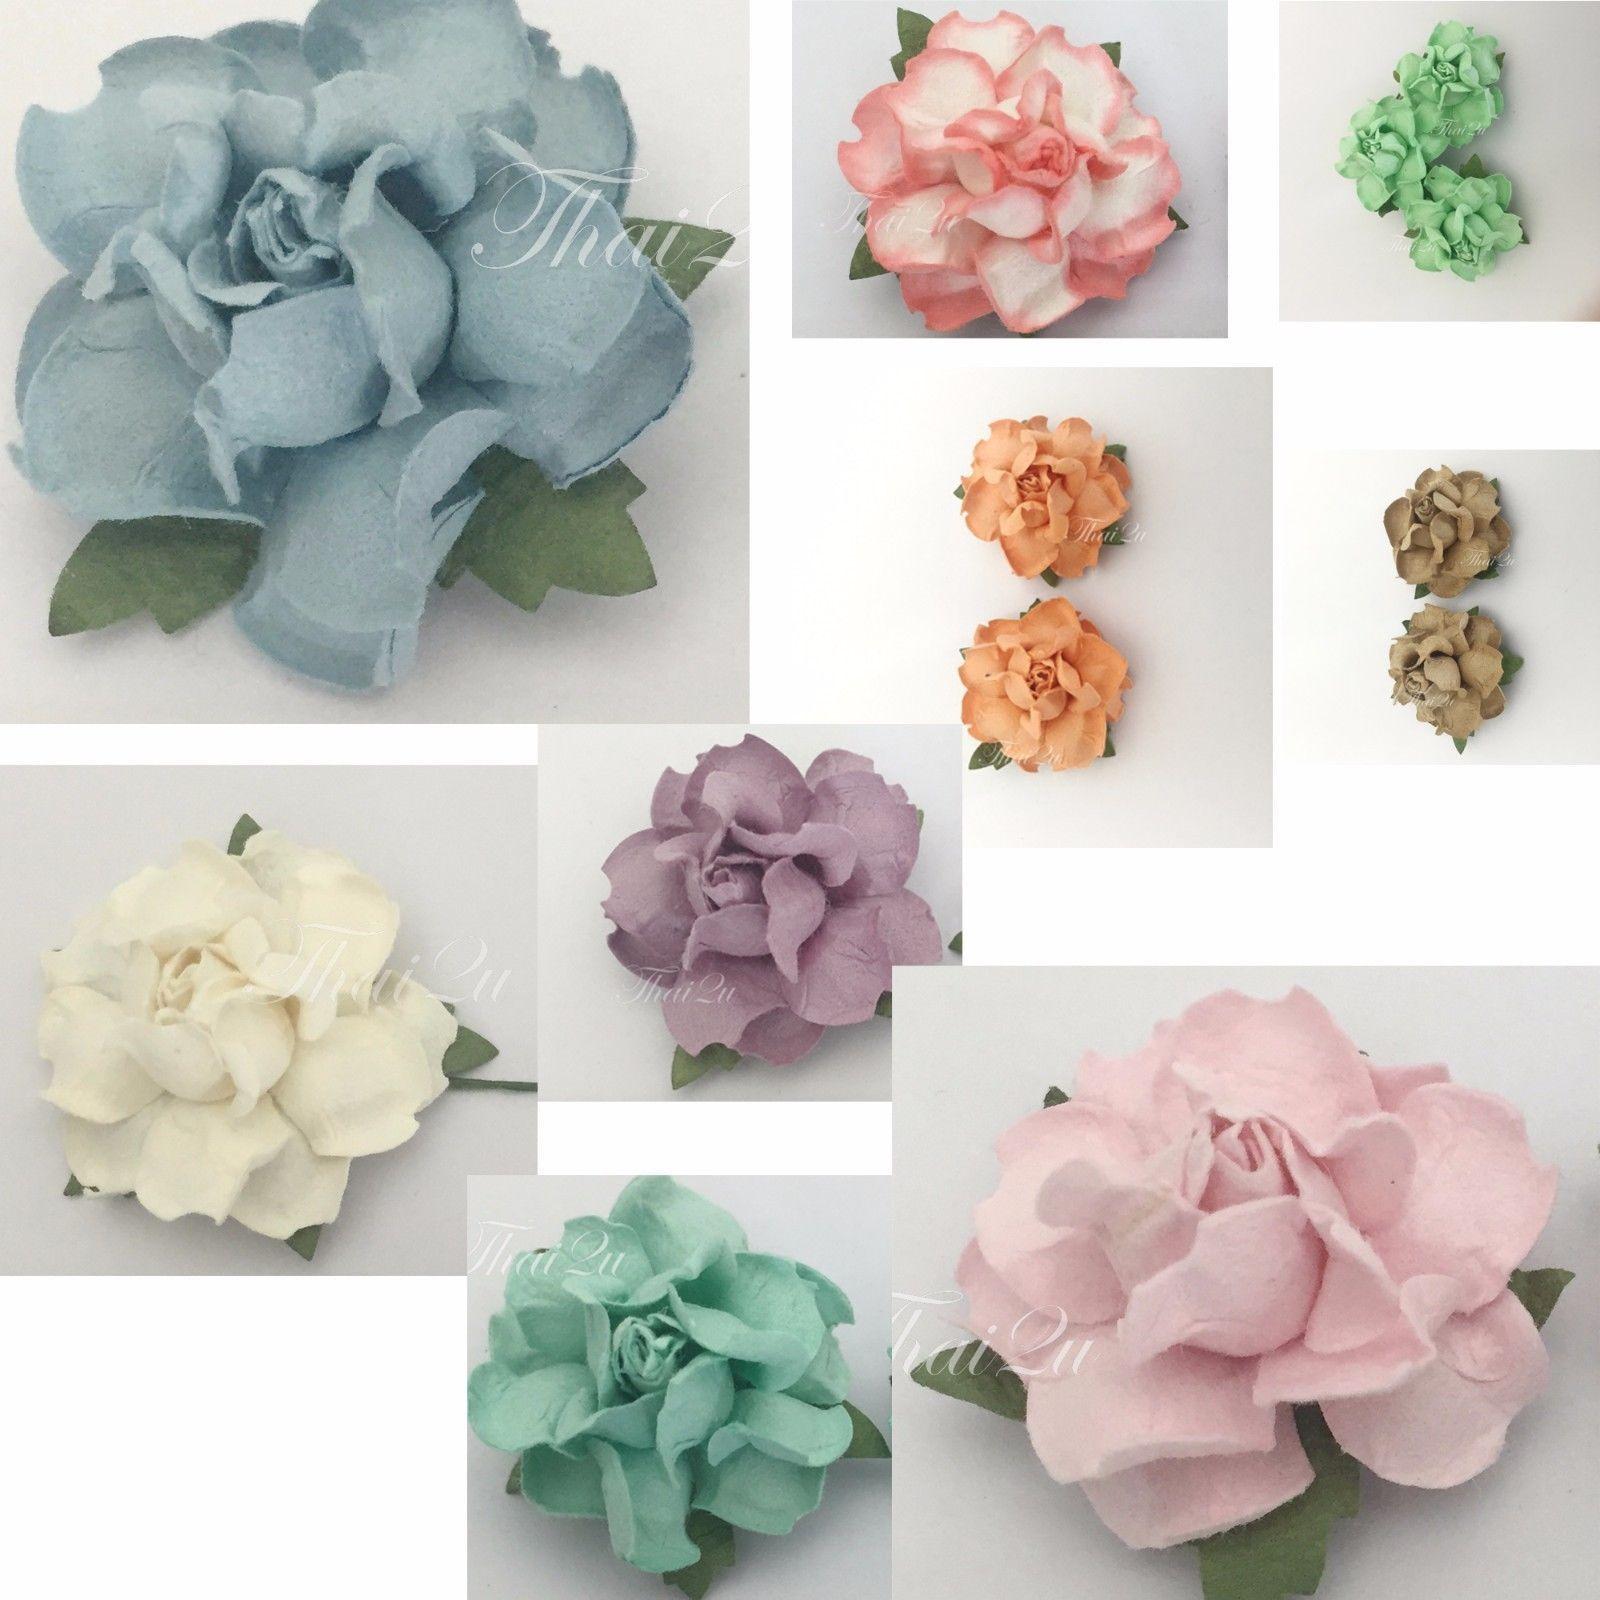 Diy paper flower wedding decorations   Pastel Mulberry Paper Flower Diy Wedding Card Craft Scrapbook